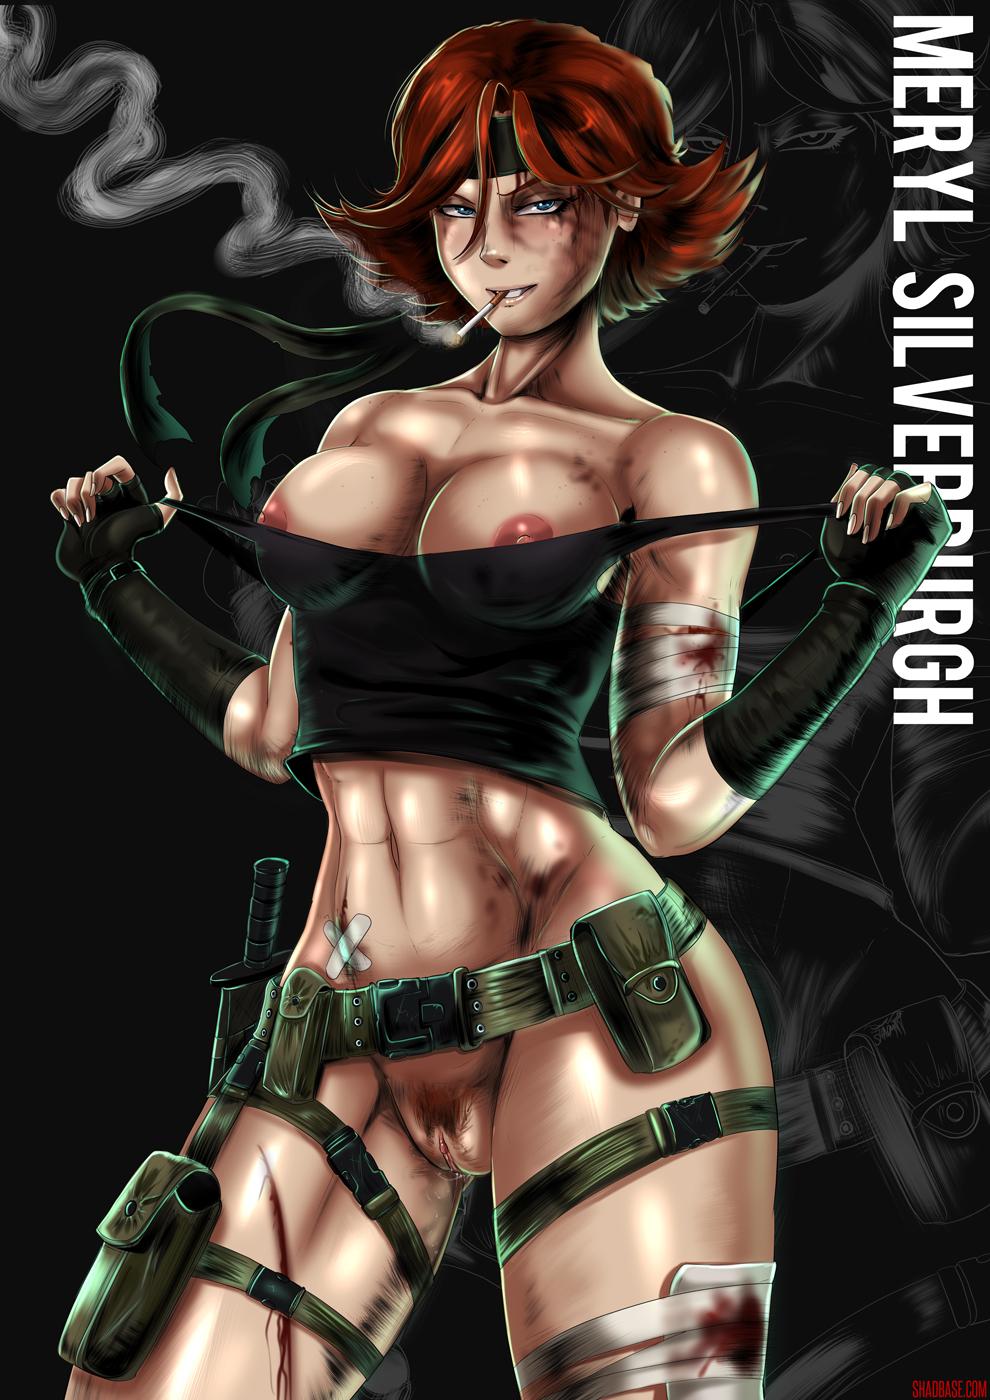 Girls of Metal Gear: Meryl